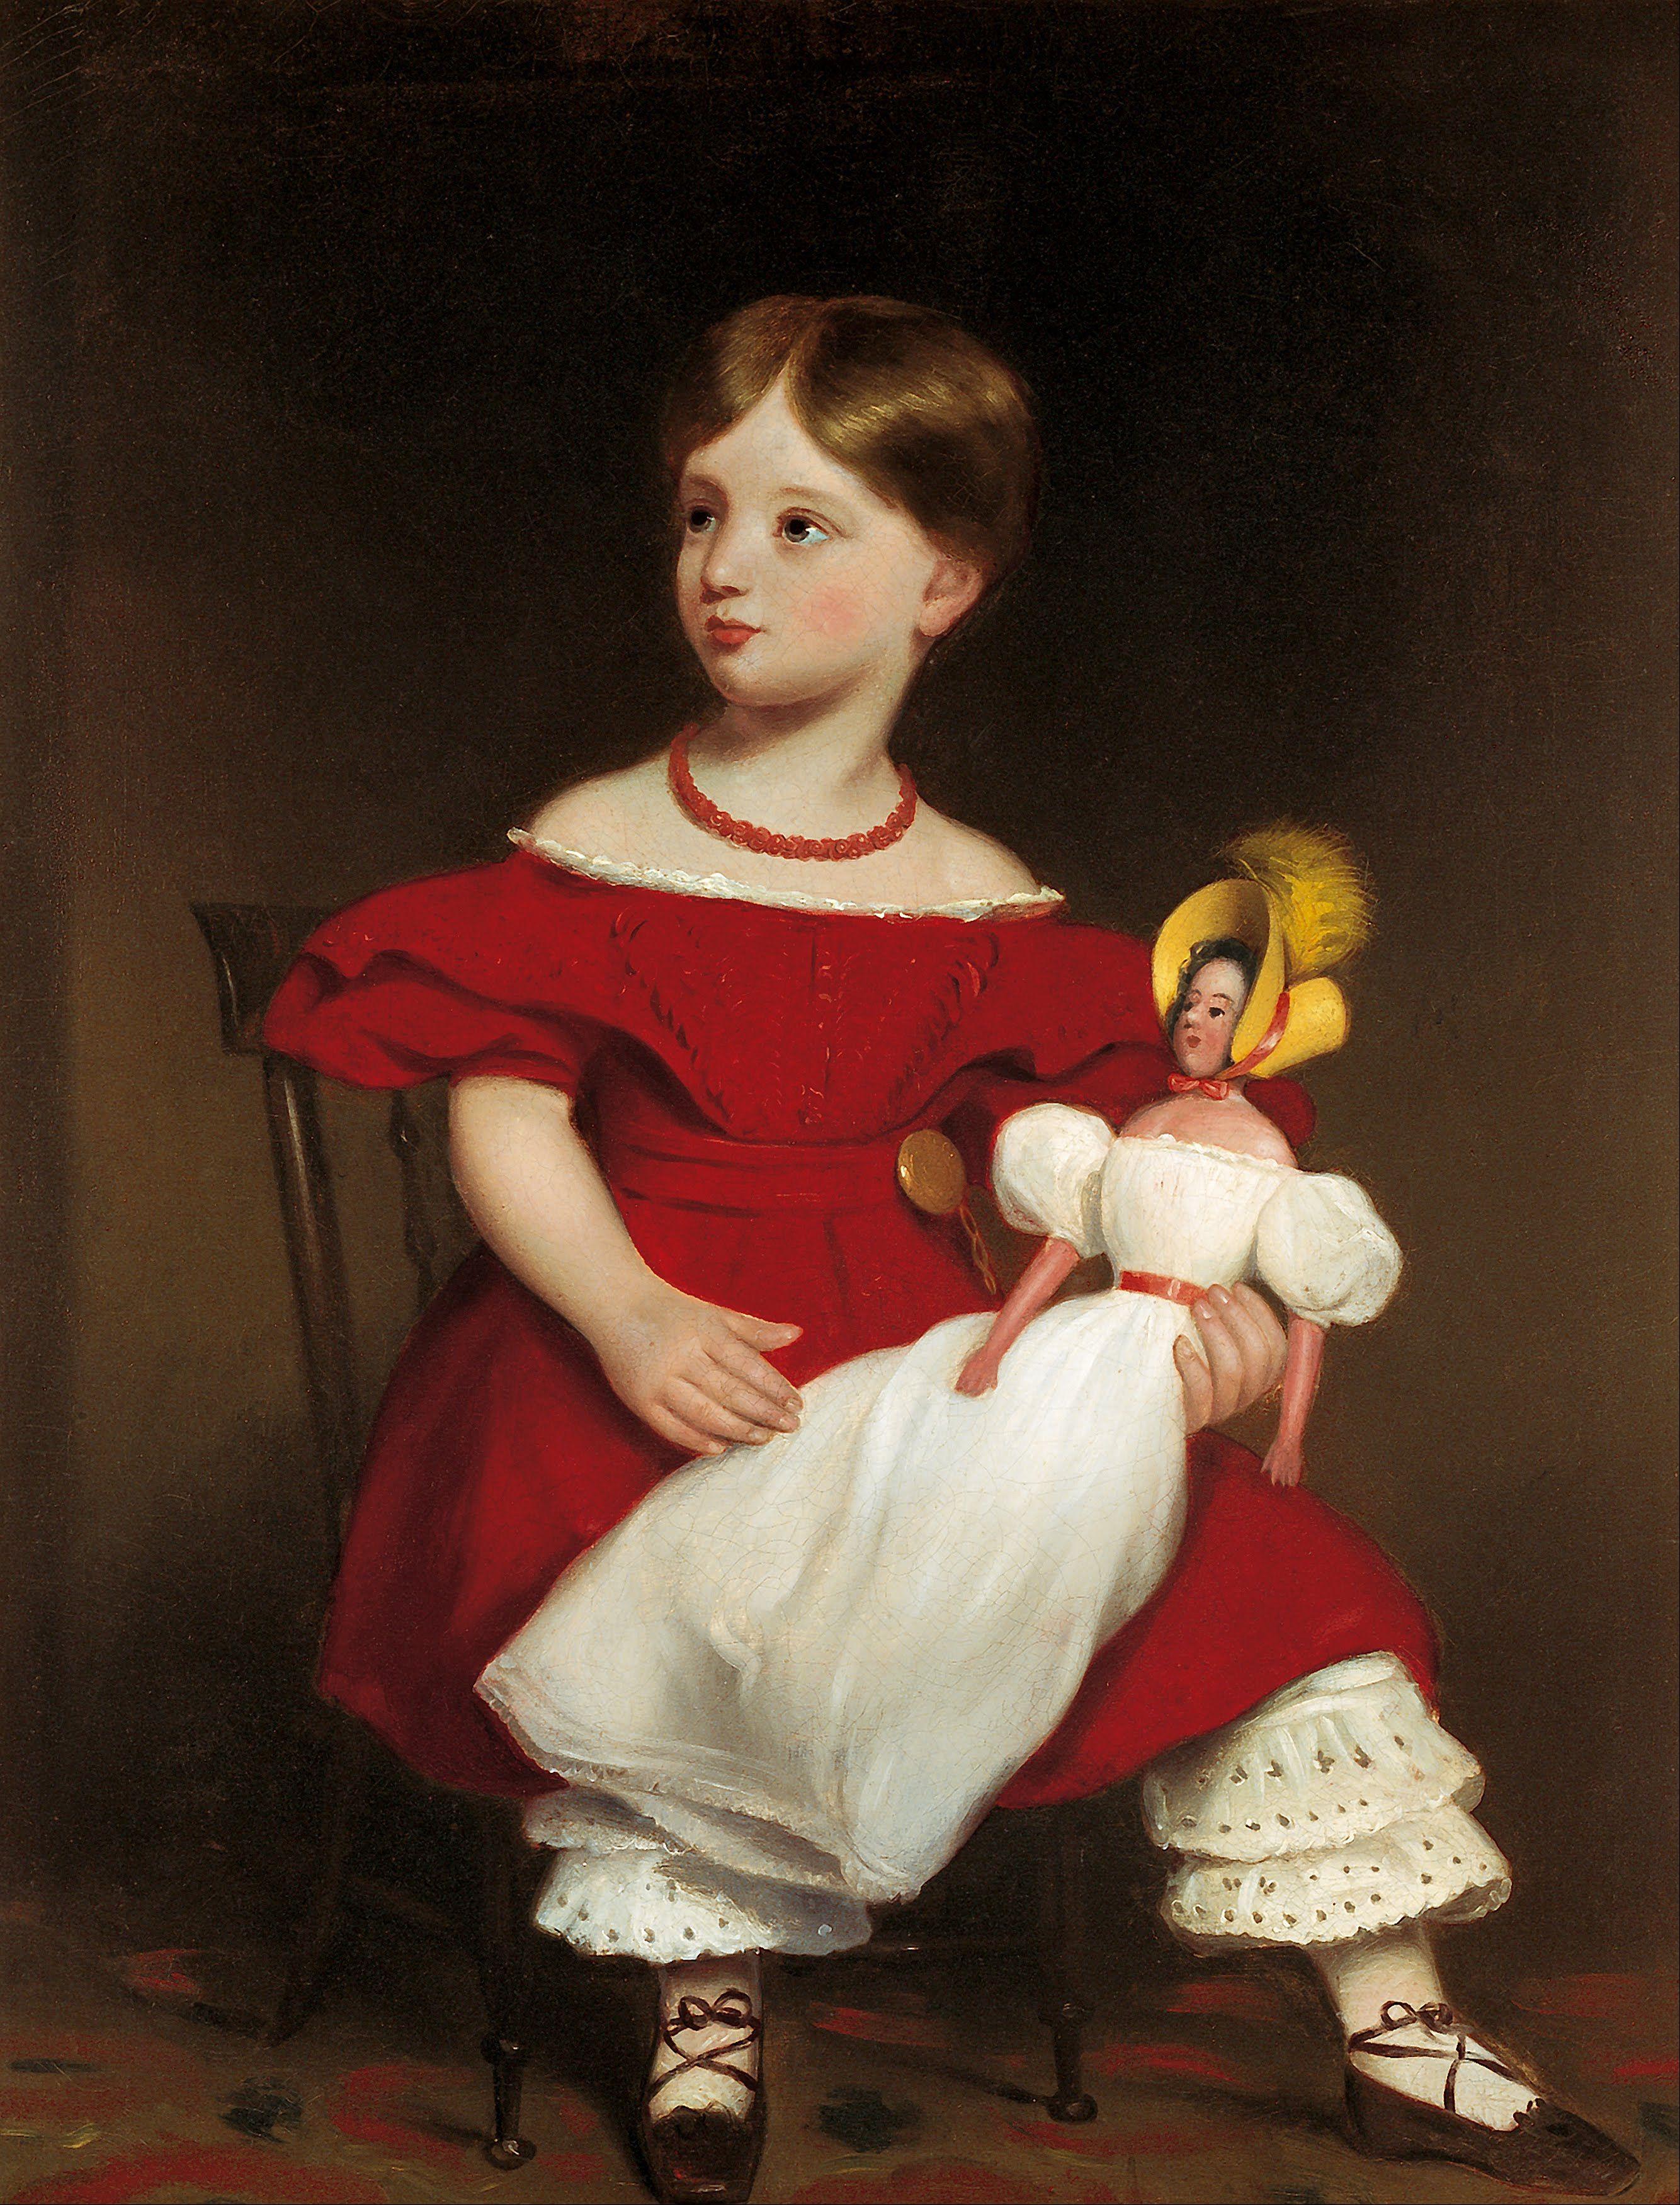 Attributed to Thomas Bock: Eliza Langhorne. ca. 1849.